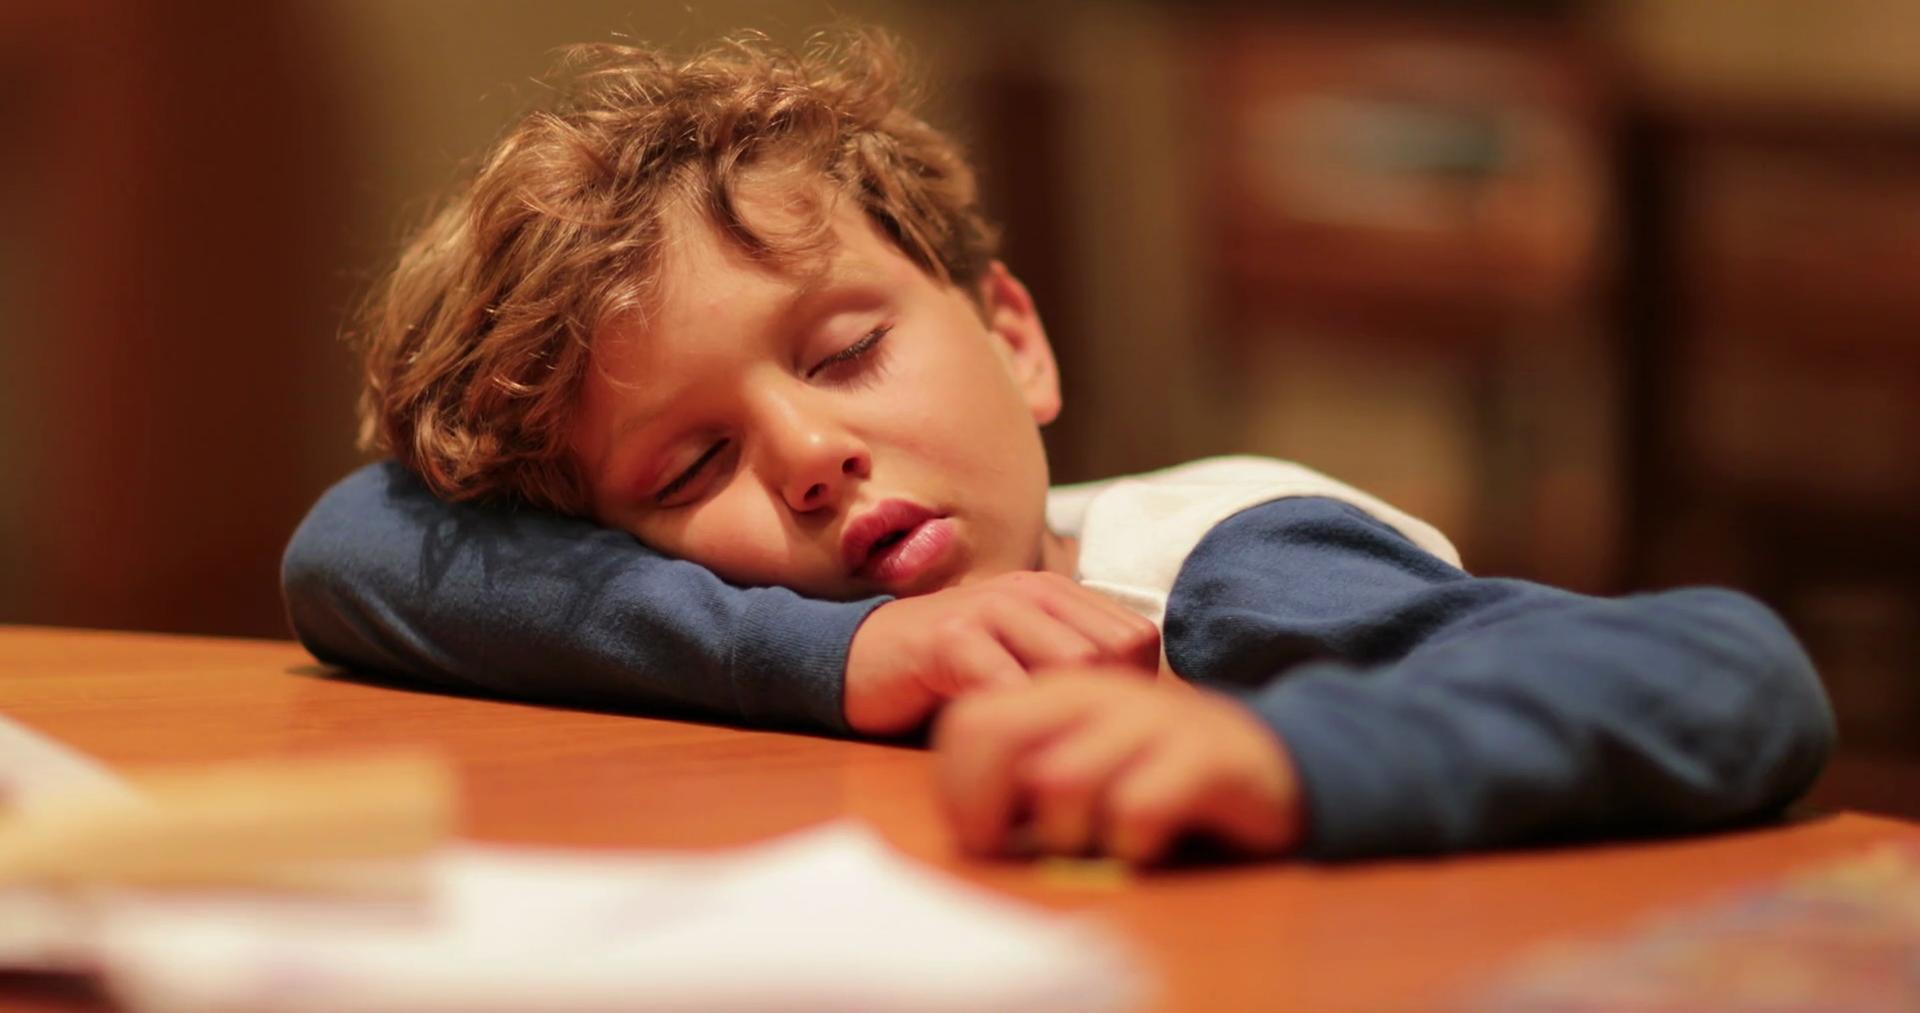 How to Sleep Longer (for Kids and Teens)